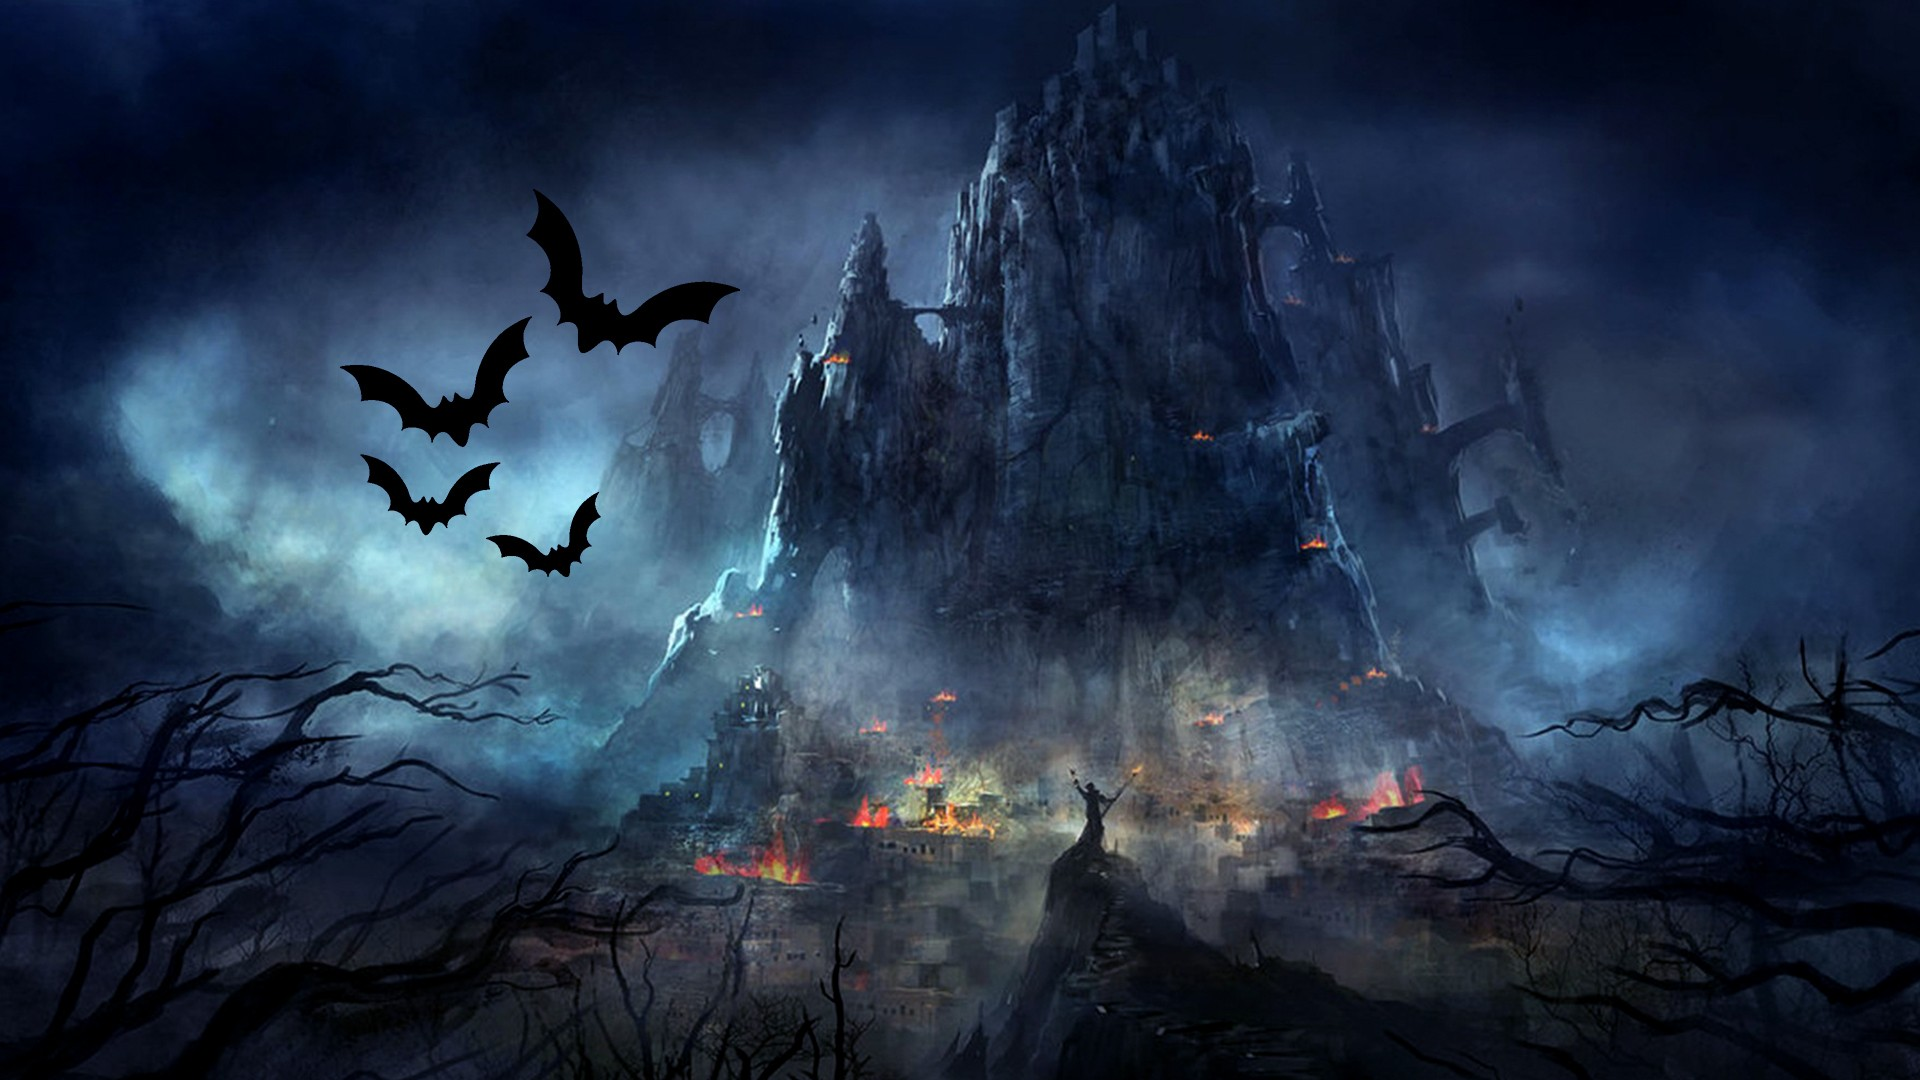 Halloween Bat Background Wallpaper